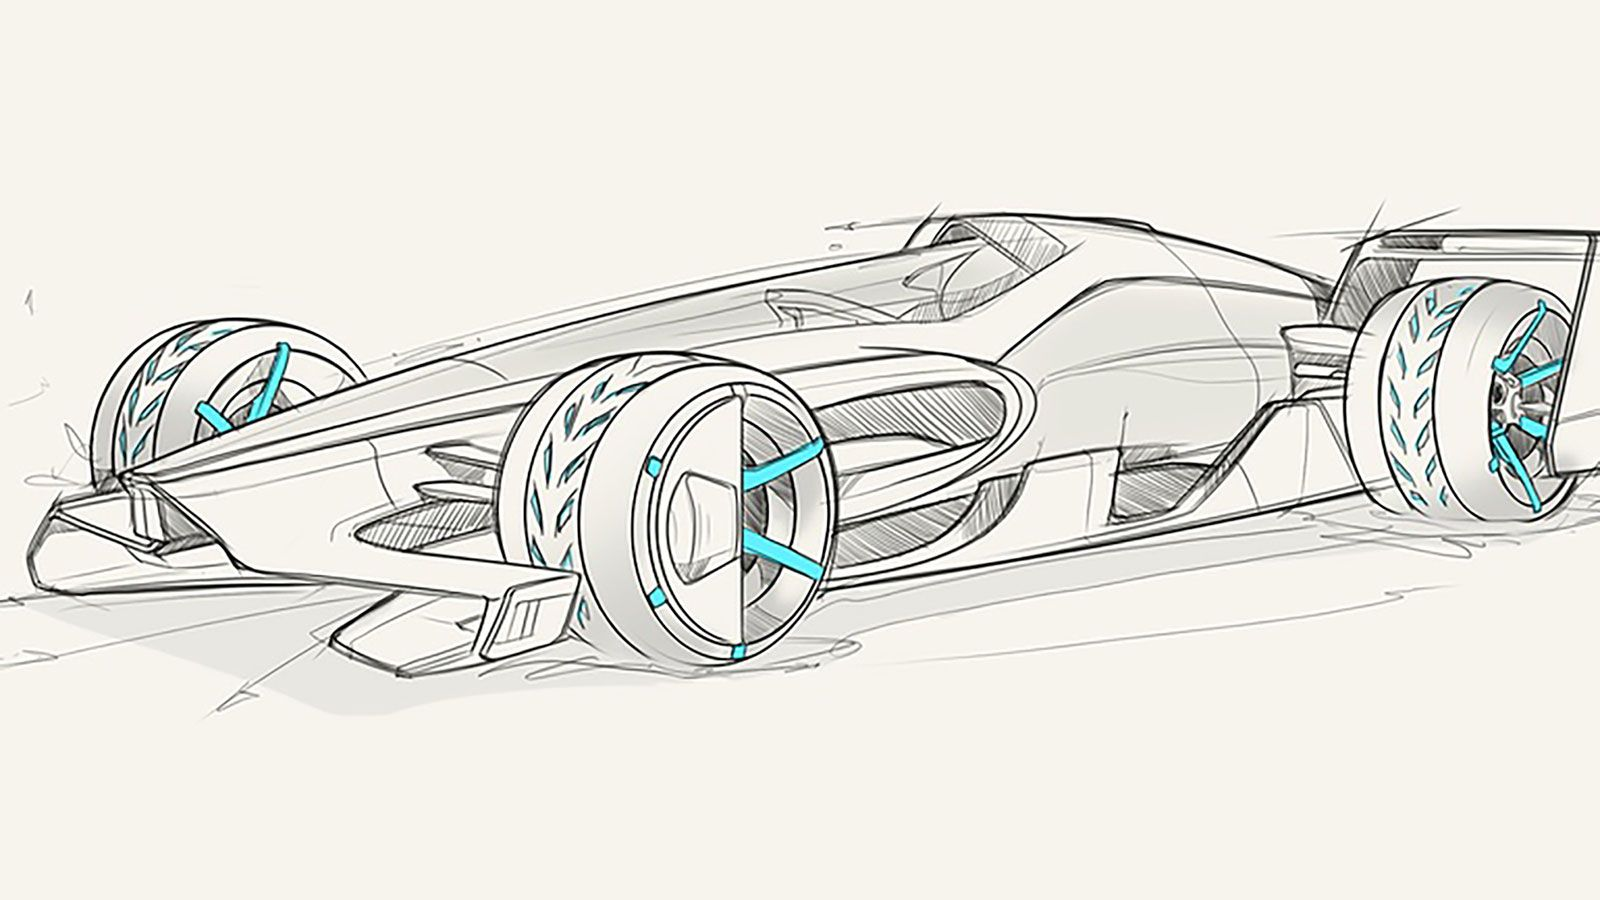 Mclaren Mclextreme 2050 Concept Envisions The Future Of Formula 1 Car Body Design In 2020 Car Design Sketch Design Sketch Concept